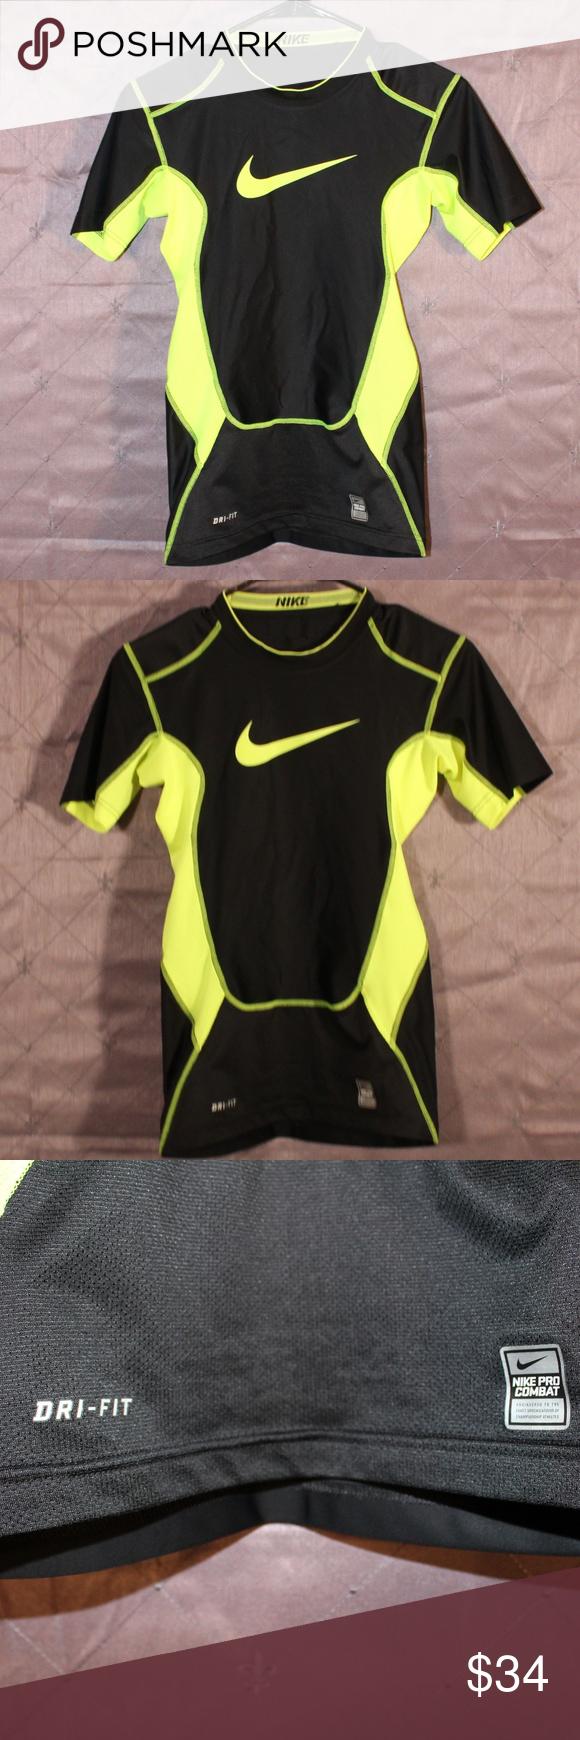 Compression shirt, Nike pro combat, Dri fit